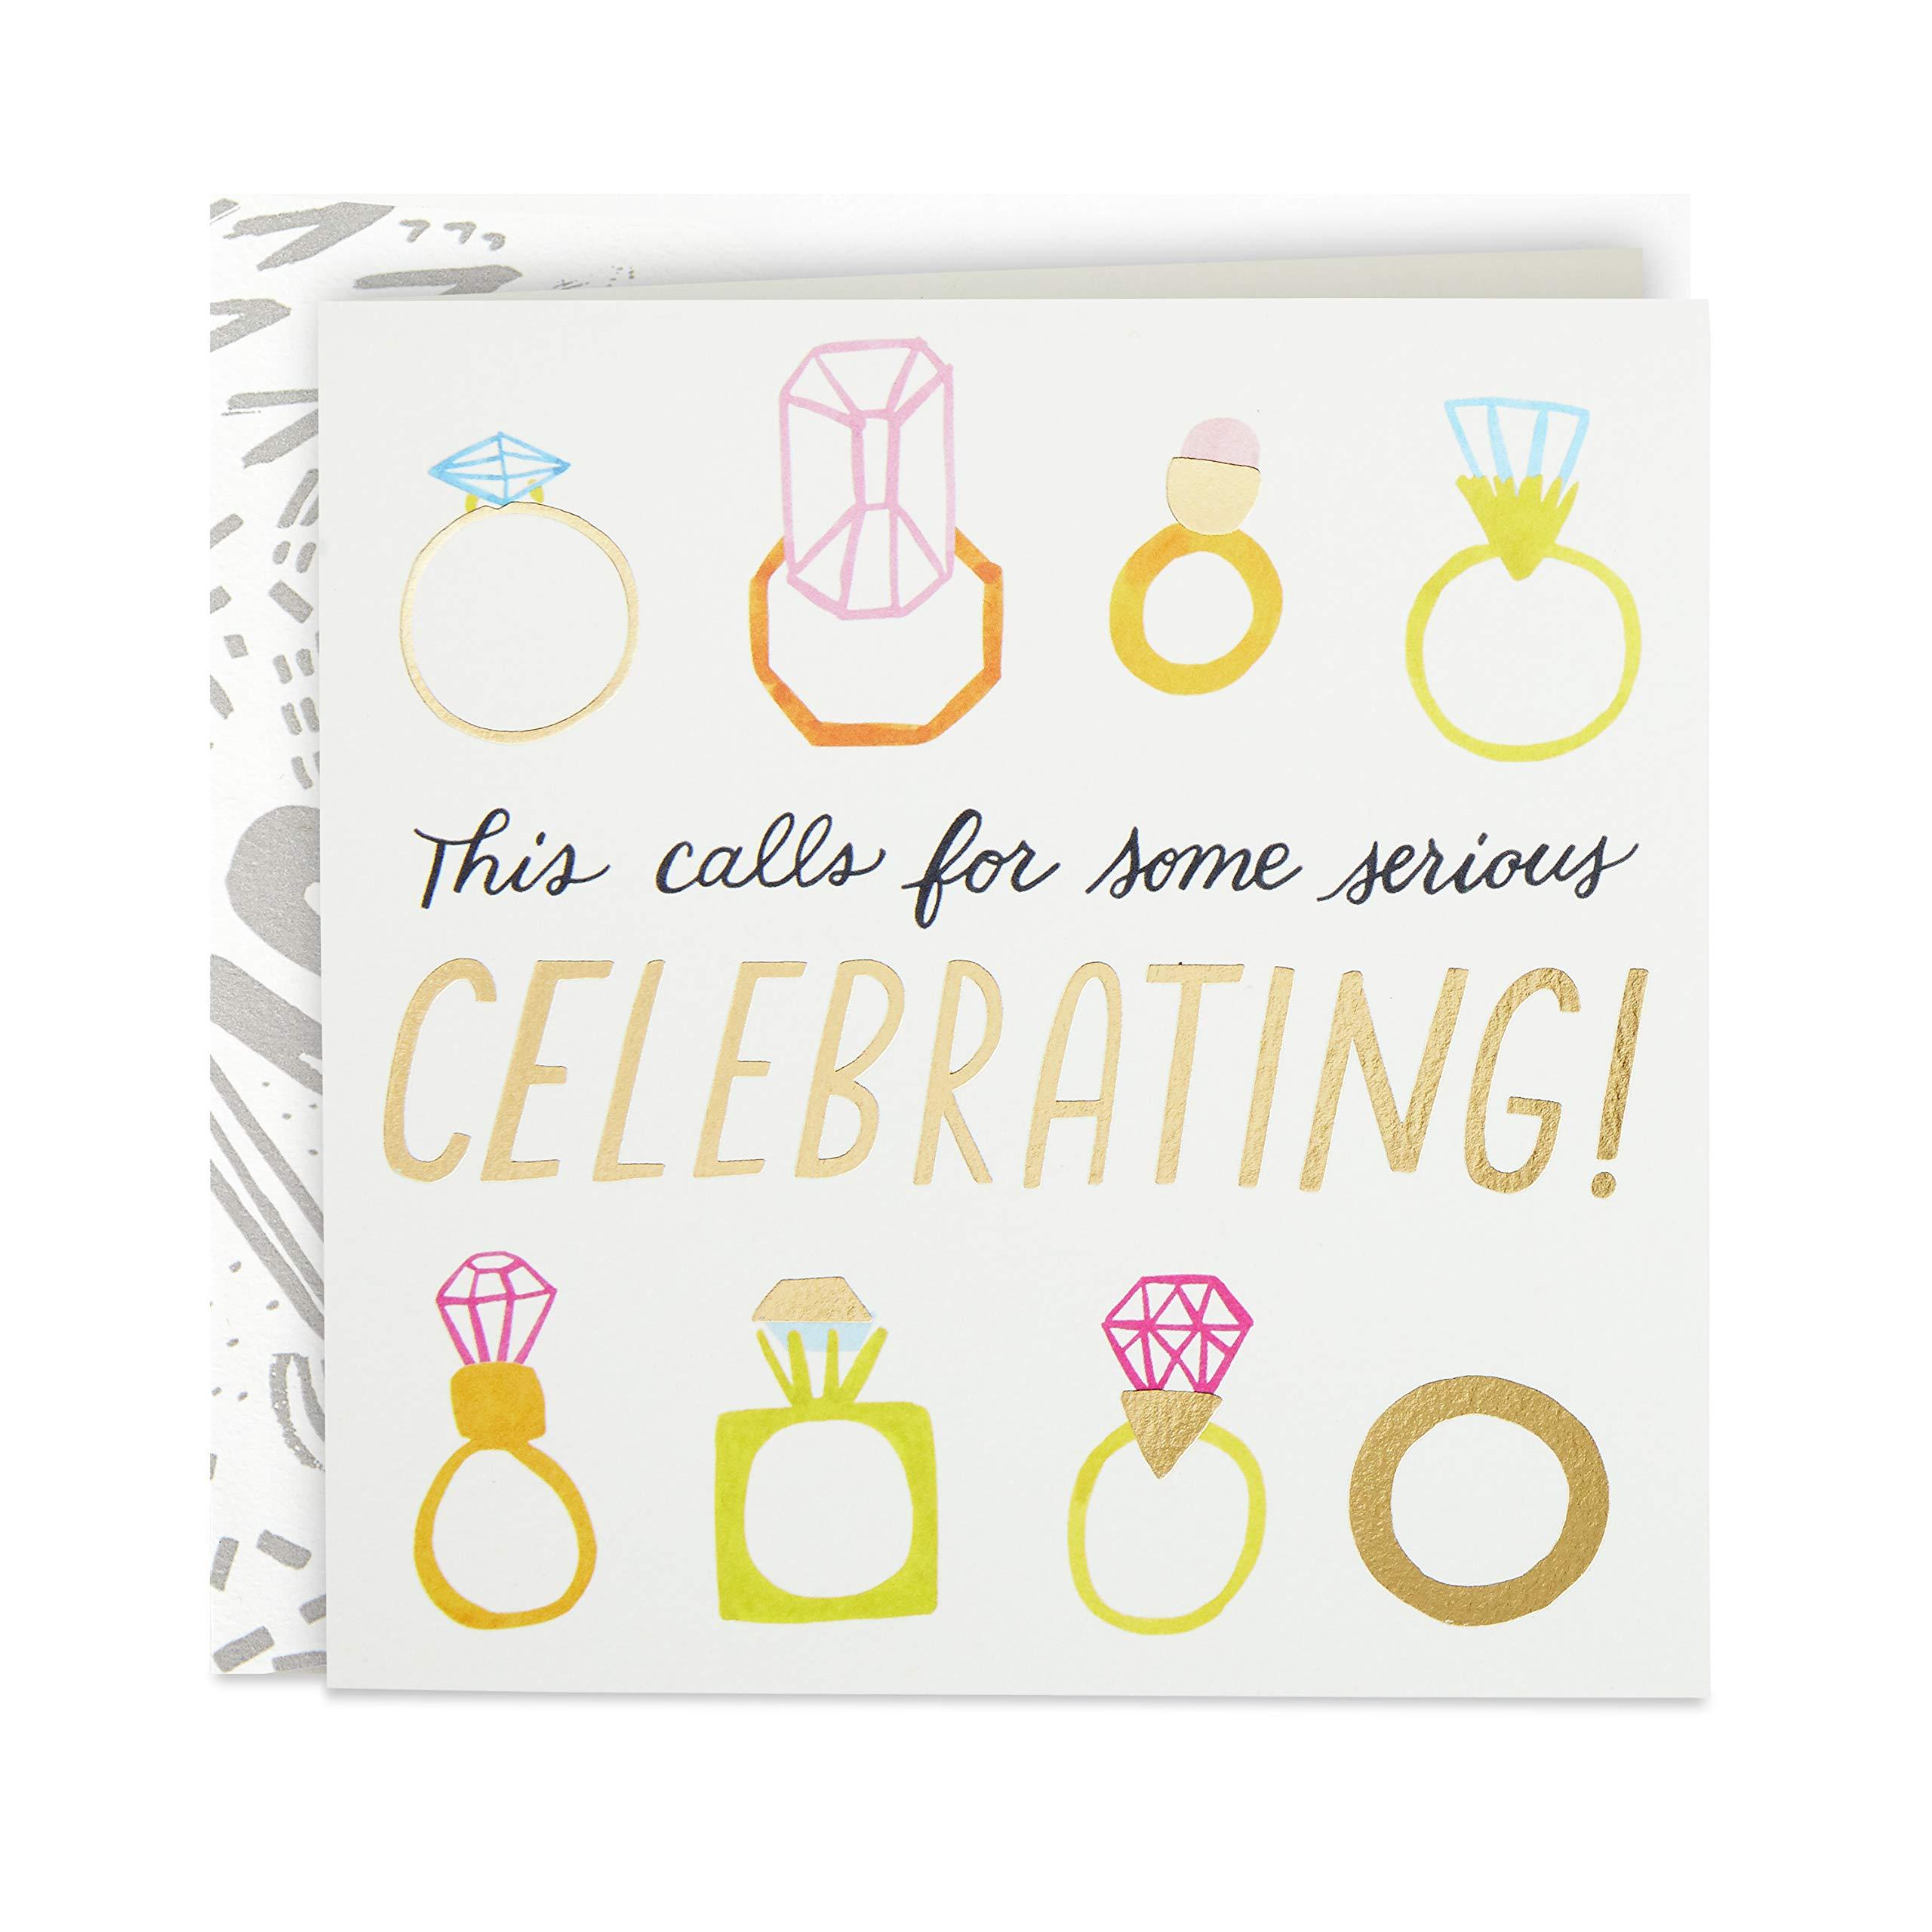 Hallmark Good Mail 婚礼卡,新娘淋浴卡,订婚卡(戒指)